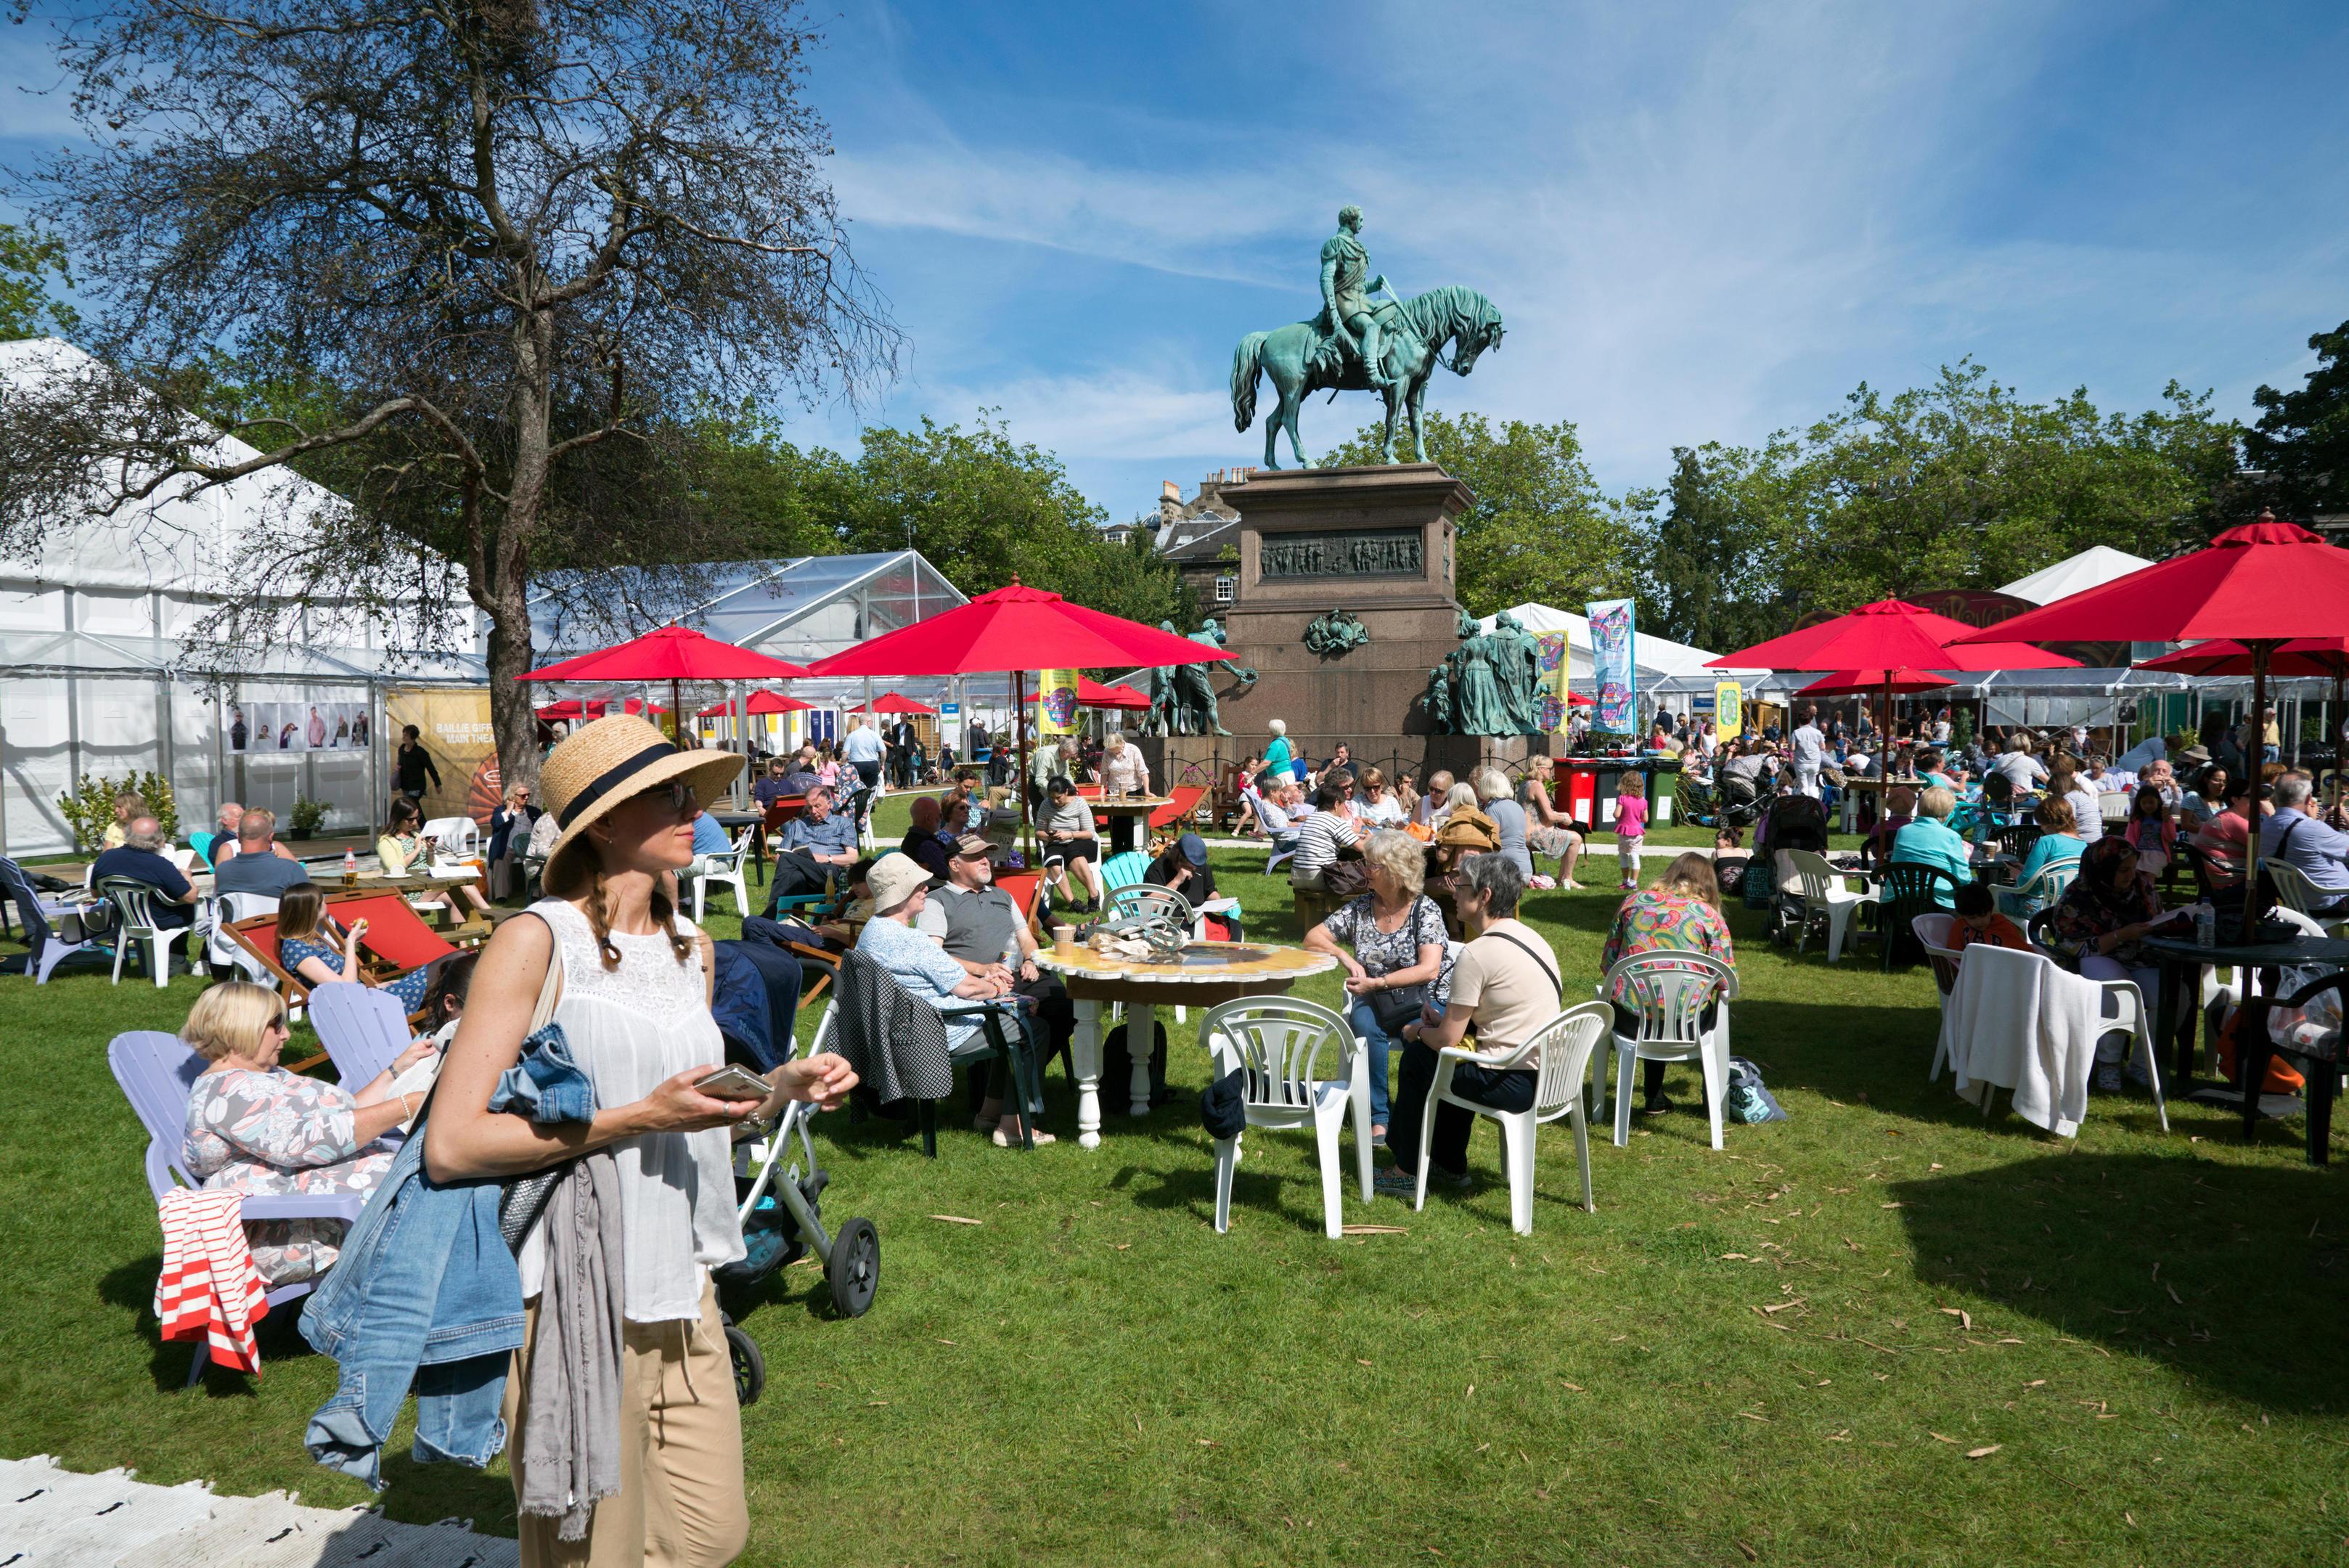 Visitors to the annual Edinburgh Book Festival enjoying the sunshine in Charlotte Square.